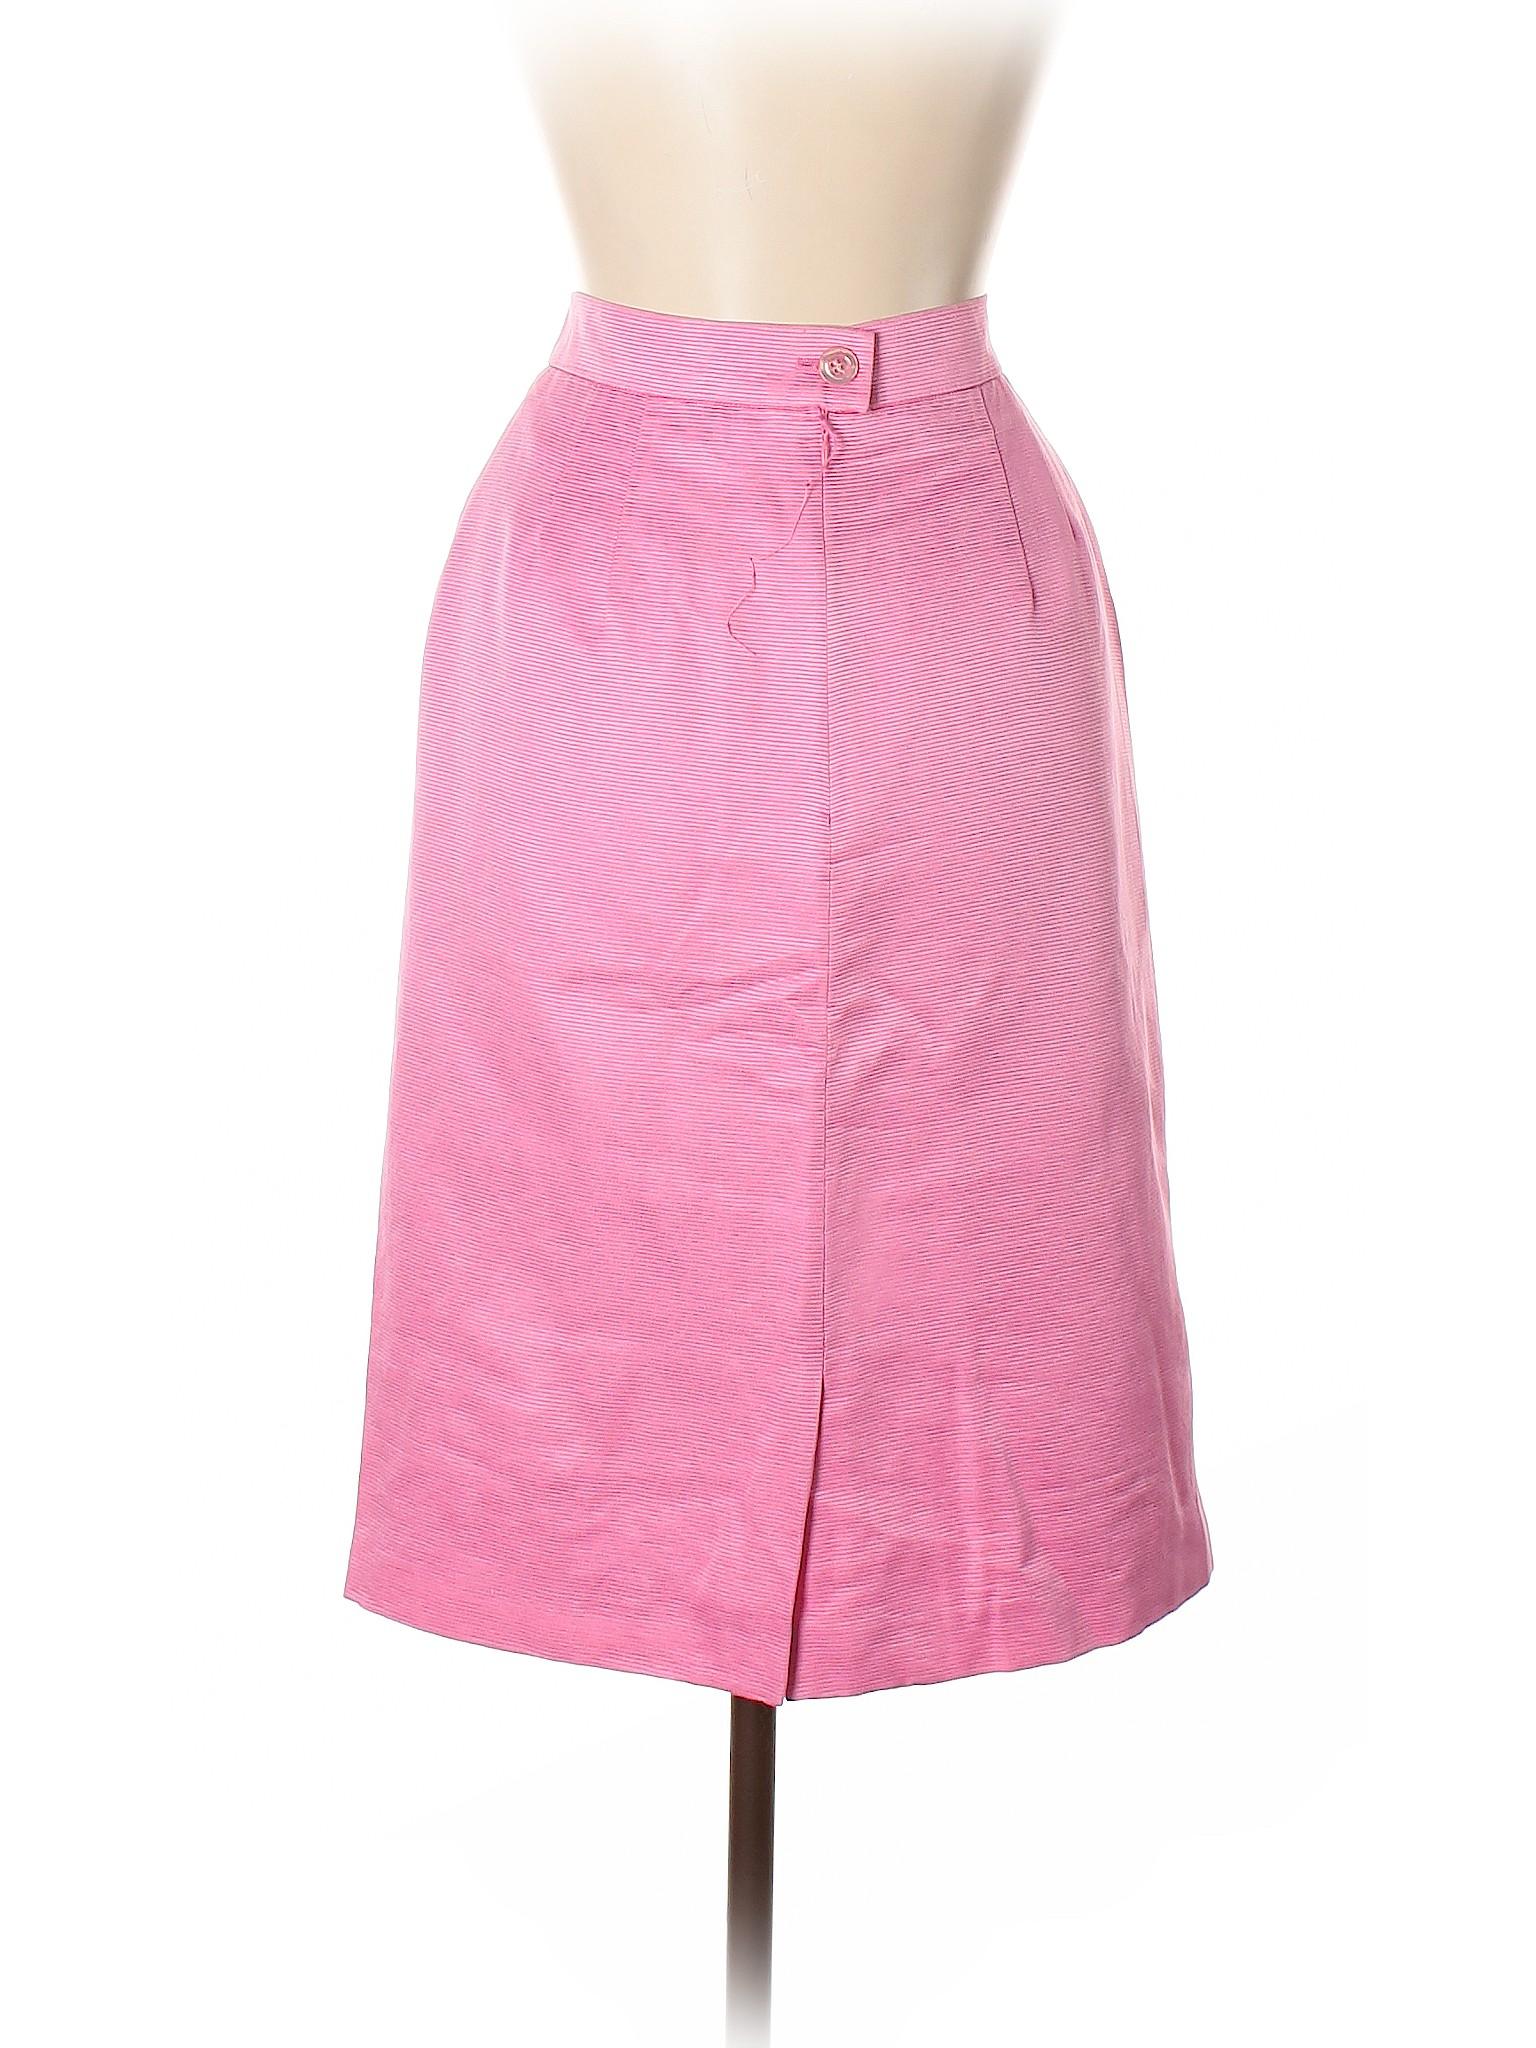 Casual Skirt Skirt Boutique Escada Escada Escada Casual Casual Boutique Skirt leisure leisure Boutique leisure UqFZwdZ